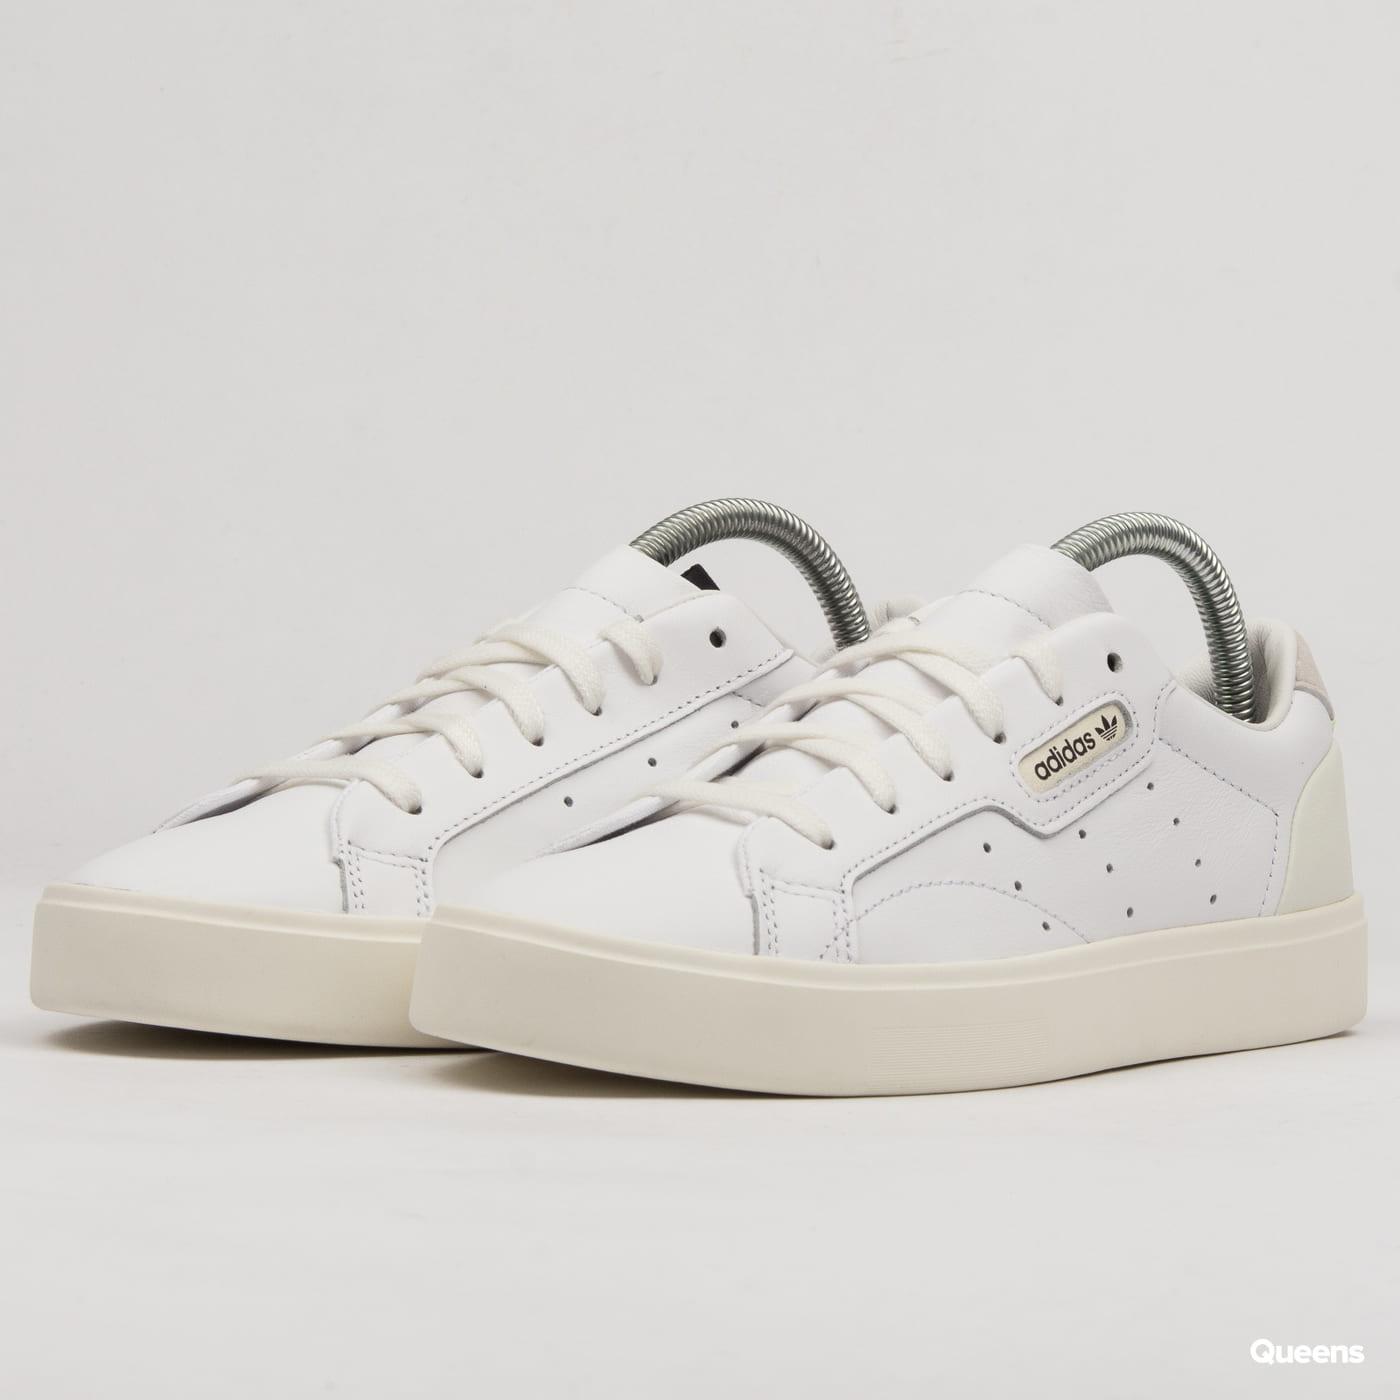 premium selection 75b85 8c679 adidas Originals adidas Sleek W (CG6199)– Queens 💚